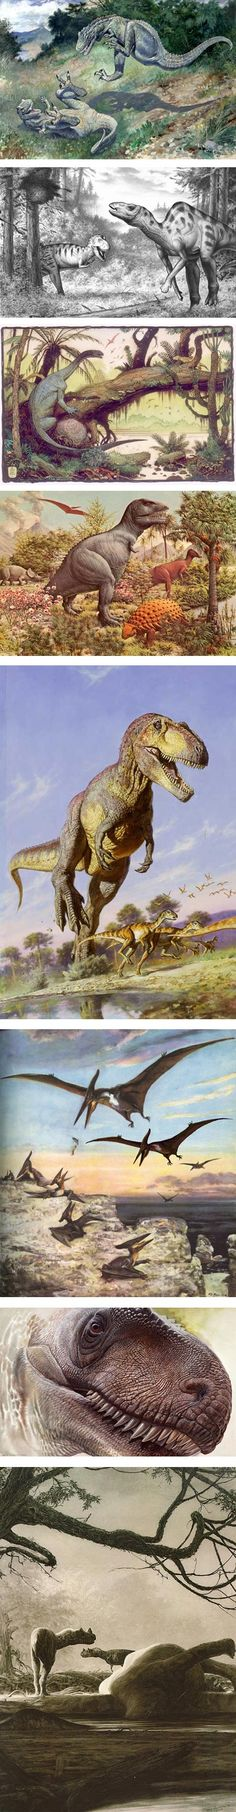 Picturing Dinosaurs on Tor.com: Charles R. Knight, Robert F. Walters, William Stout, Rudolph Zallinger, James Gurney, Zdeněk Burian, Peter Schouten,  Douglas Henderson